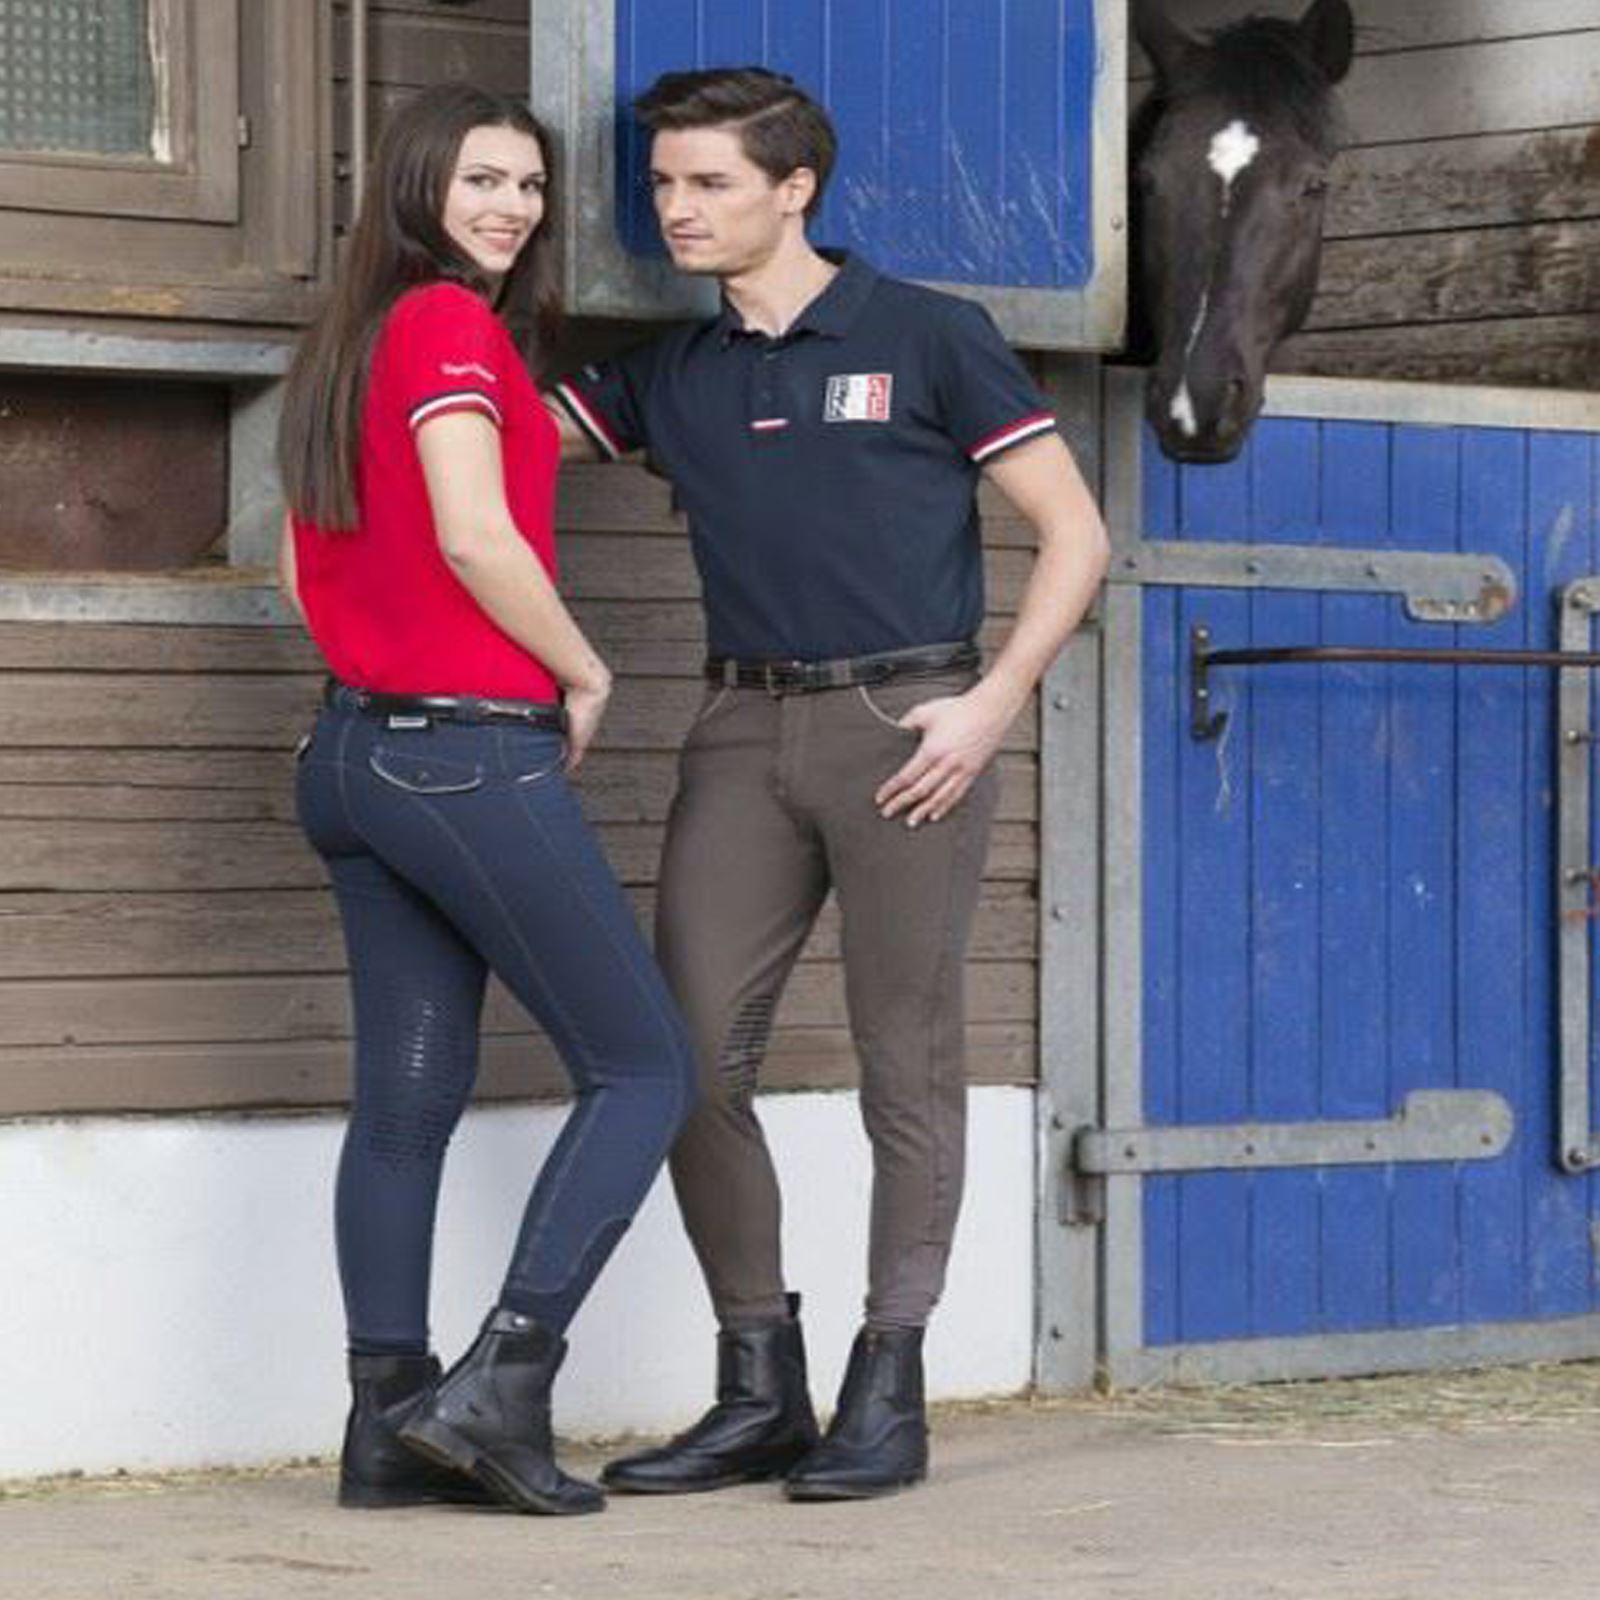 Equi-Theme Verona Breeches - Ladies Silicone Knee Patch Yard Pony Horse Riding